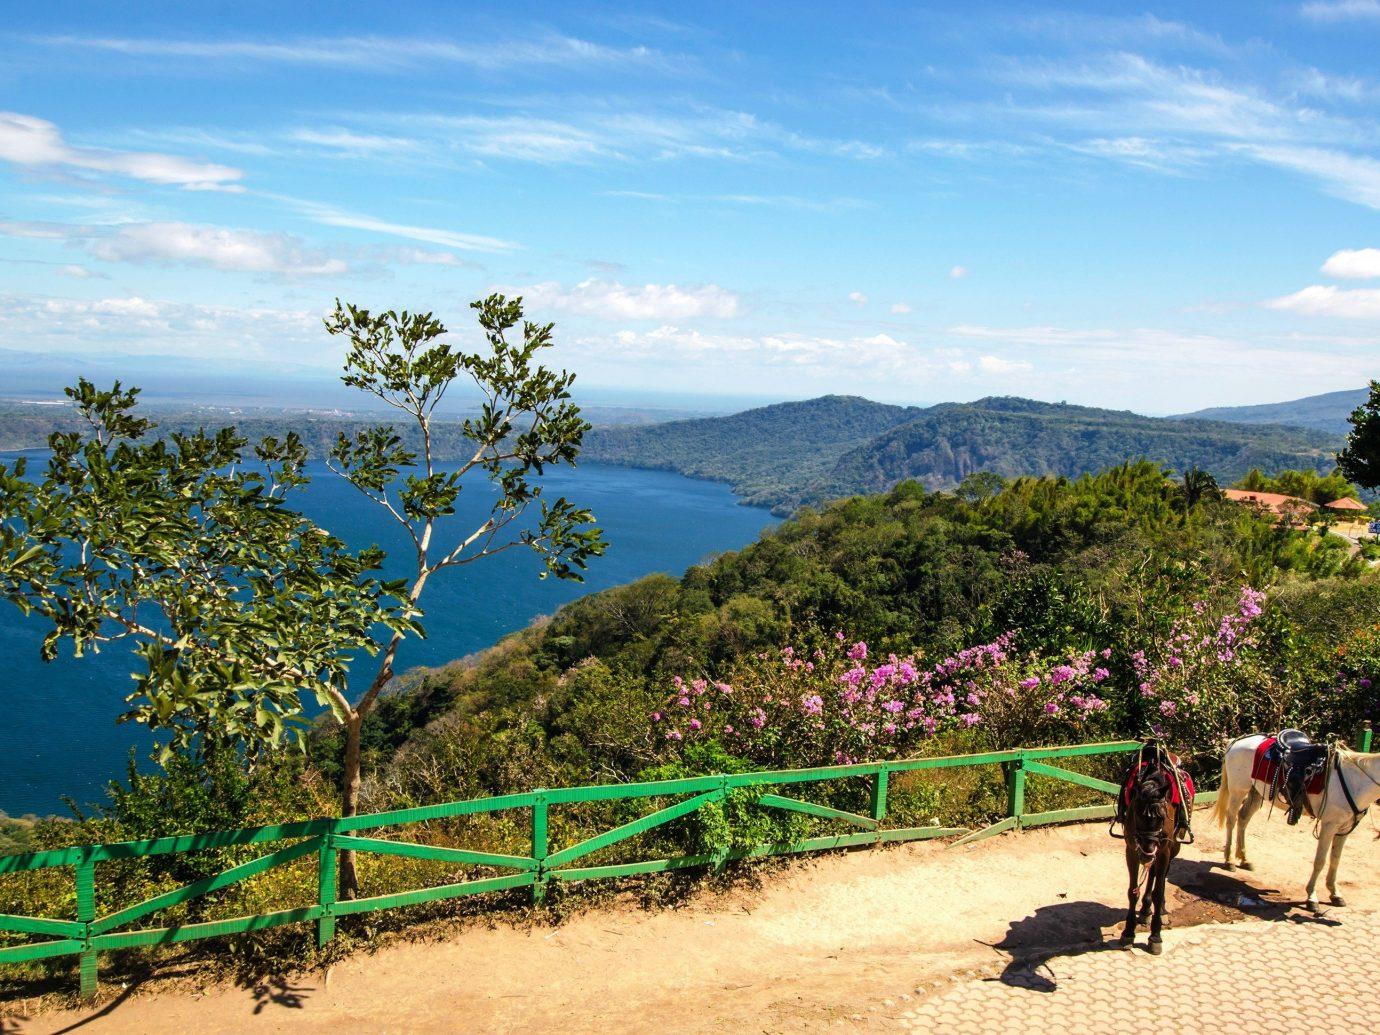 Secret Getaways Trip Ideas sky outdoor tree vacation mountain tourism landscape rural area Beach Sea flower